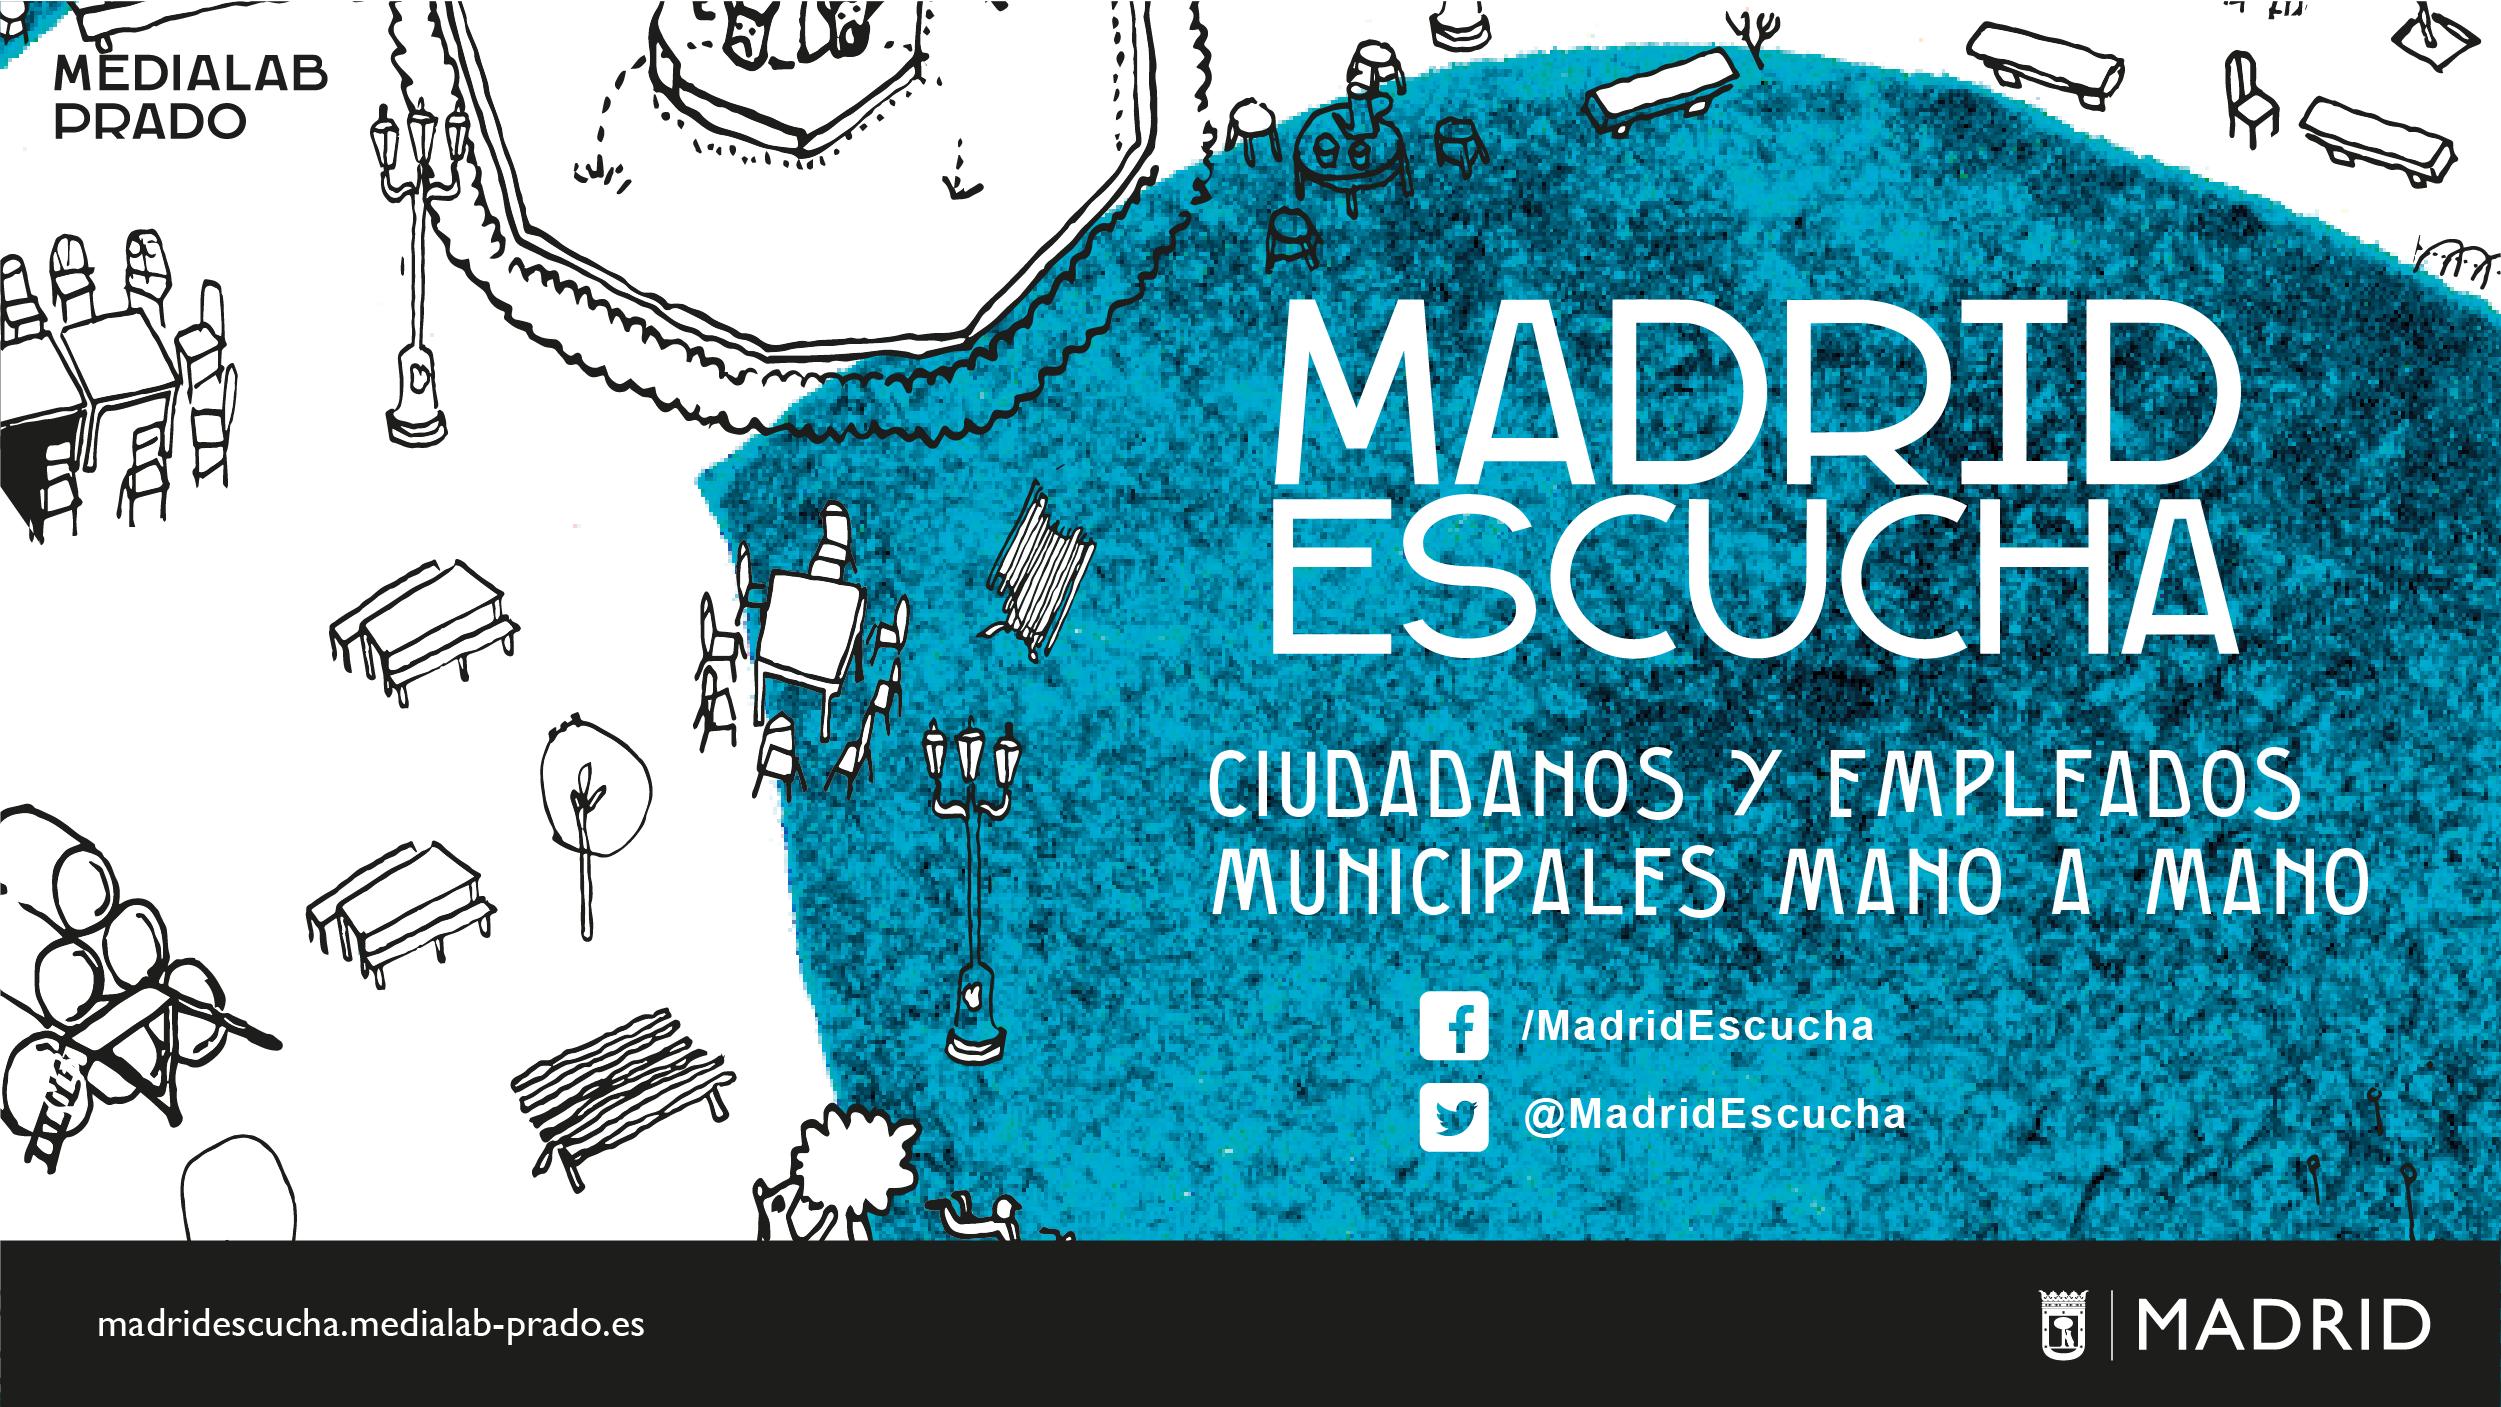 Madrid escucha